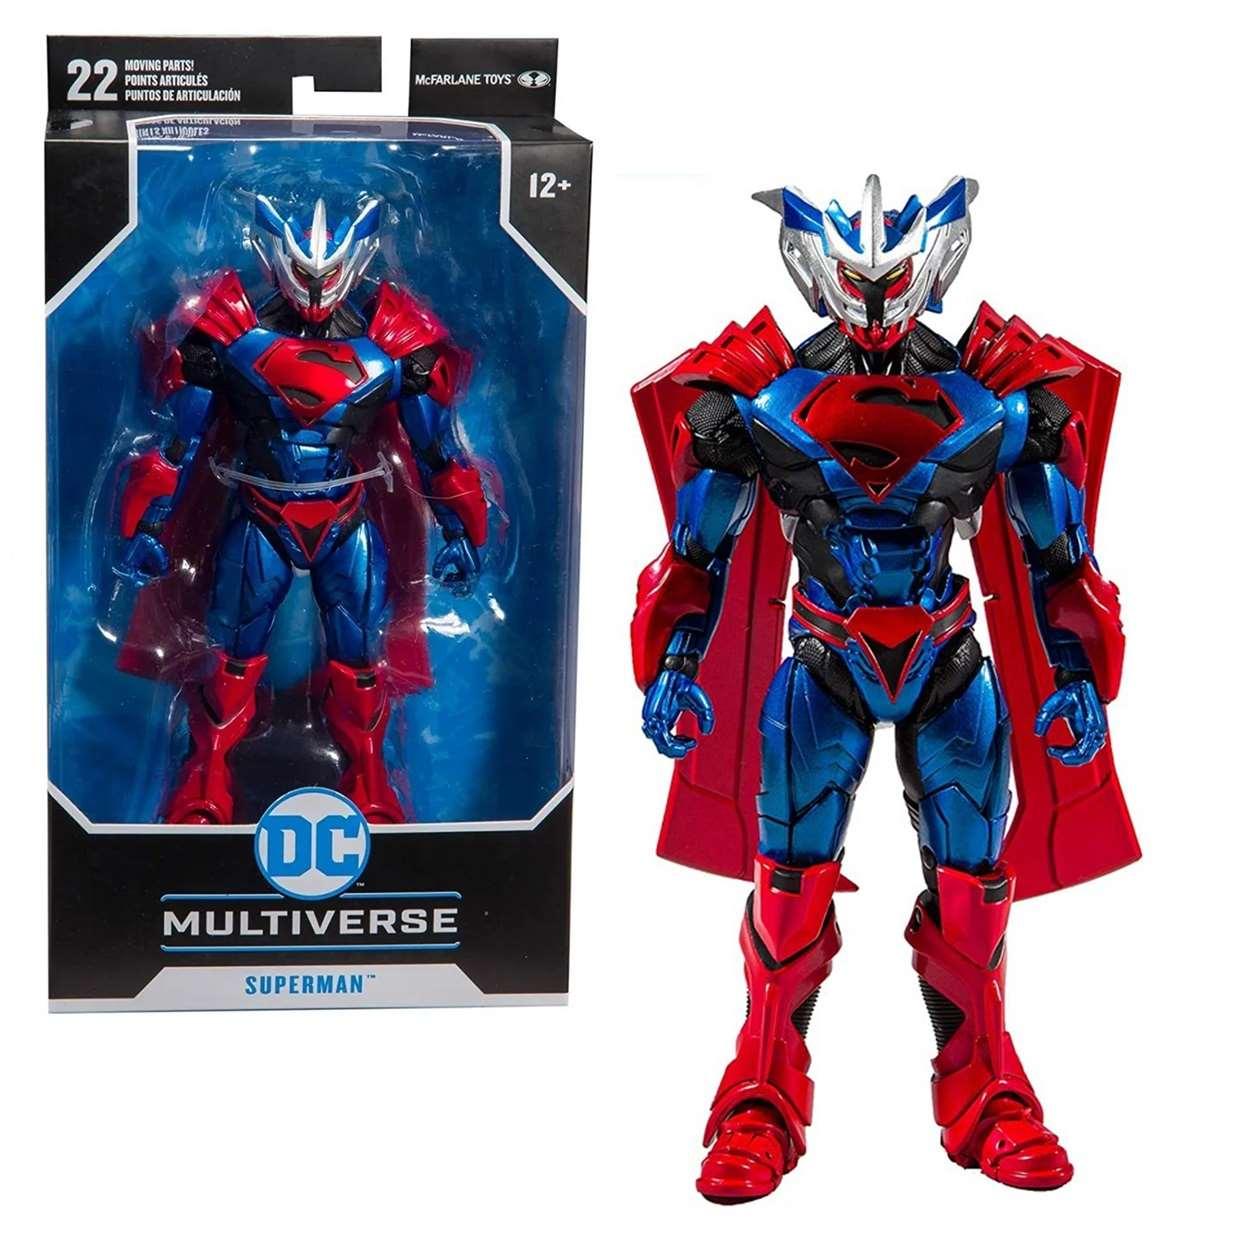 Superman Unchained Armor Figura Dc Comics Mcfarlane Toys